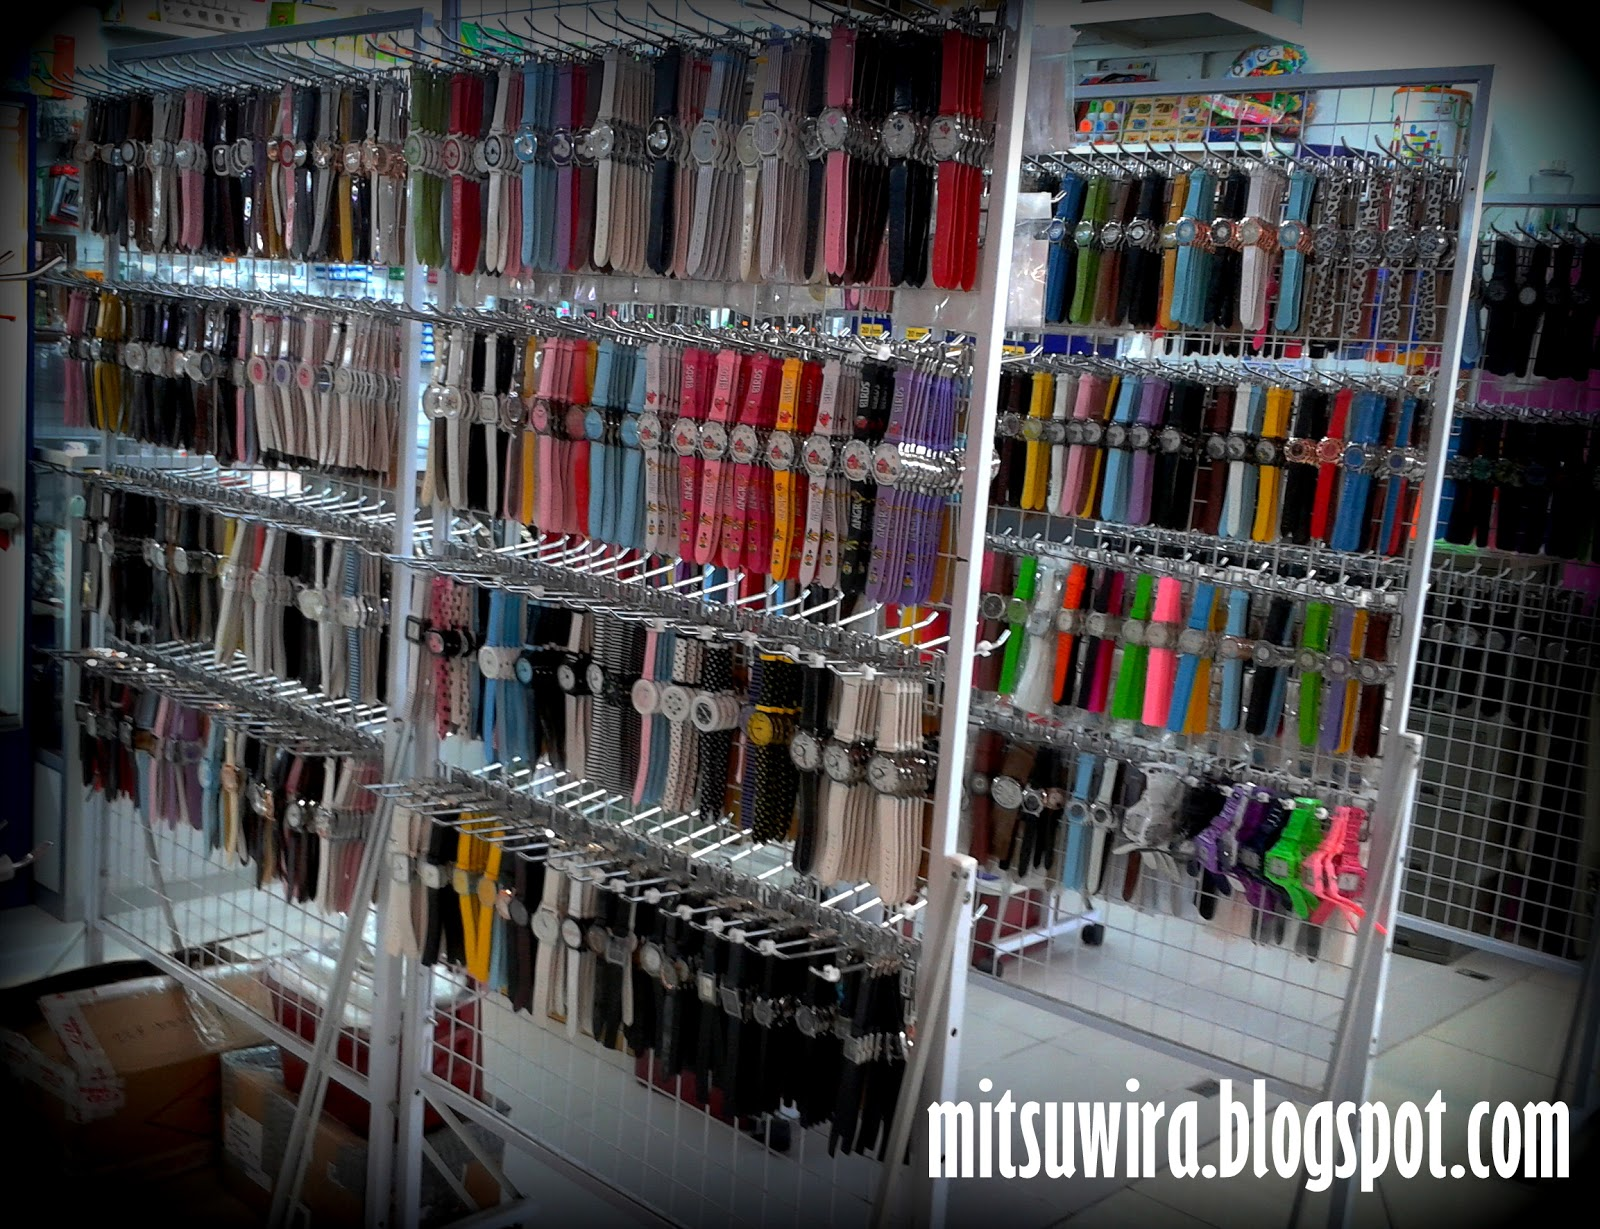 http://3.bp.blogspot.com/-iBqlPr1t6ho/UI4M8wc28kI/AAAAAAAAC6c/gcvbwPSeO1M/s1600/2012-10-19+10.41.25.jpg